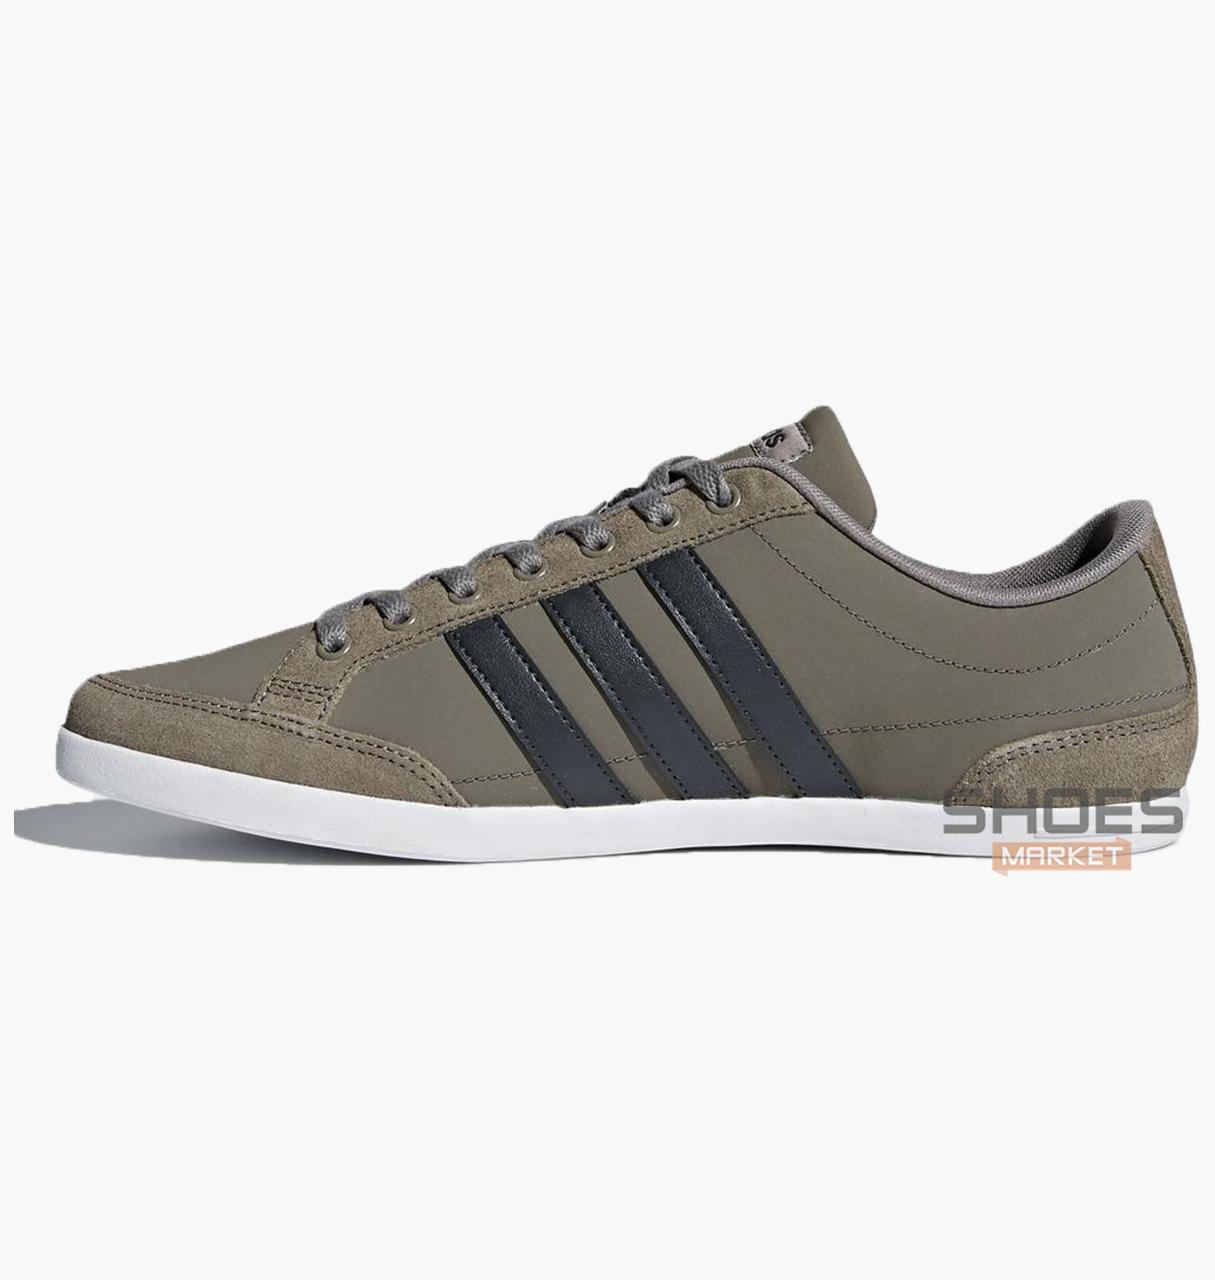 Мужские кроссовки  Adidas Caflaire Brown DB0410, оригинал